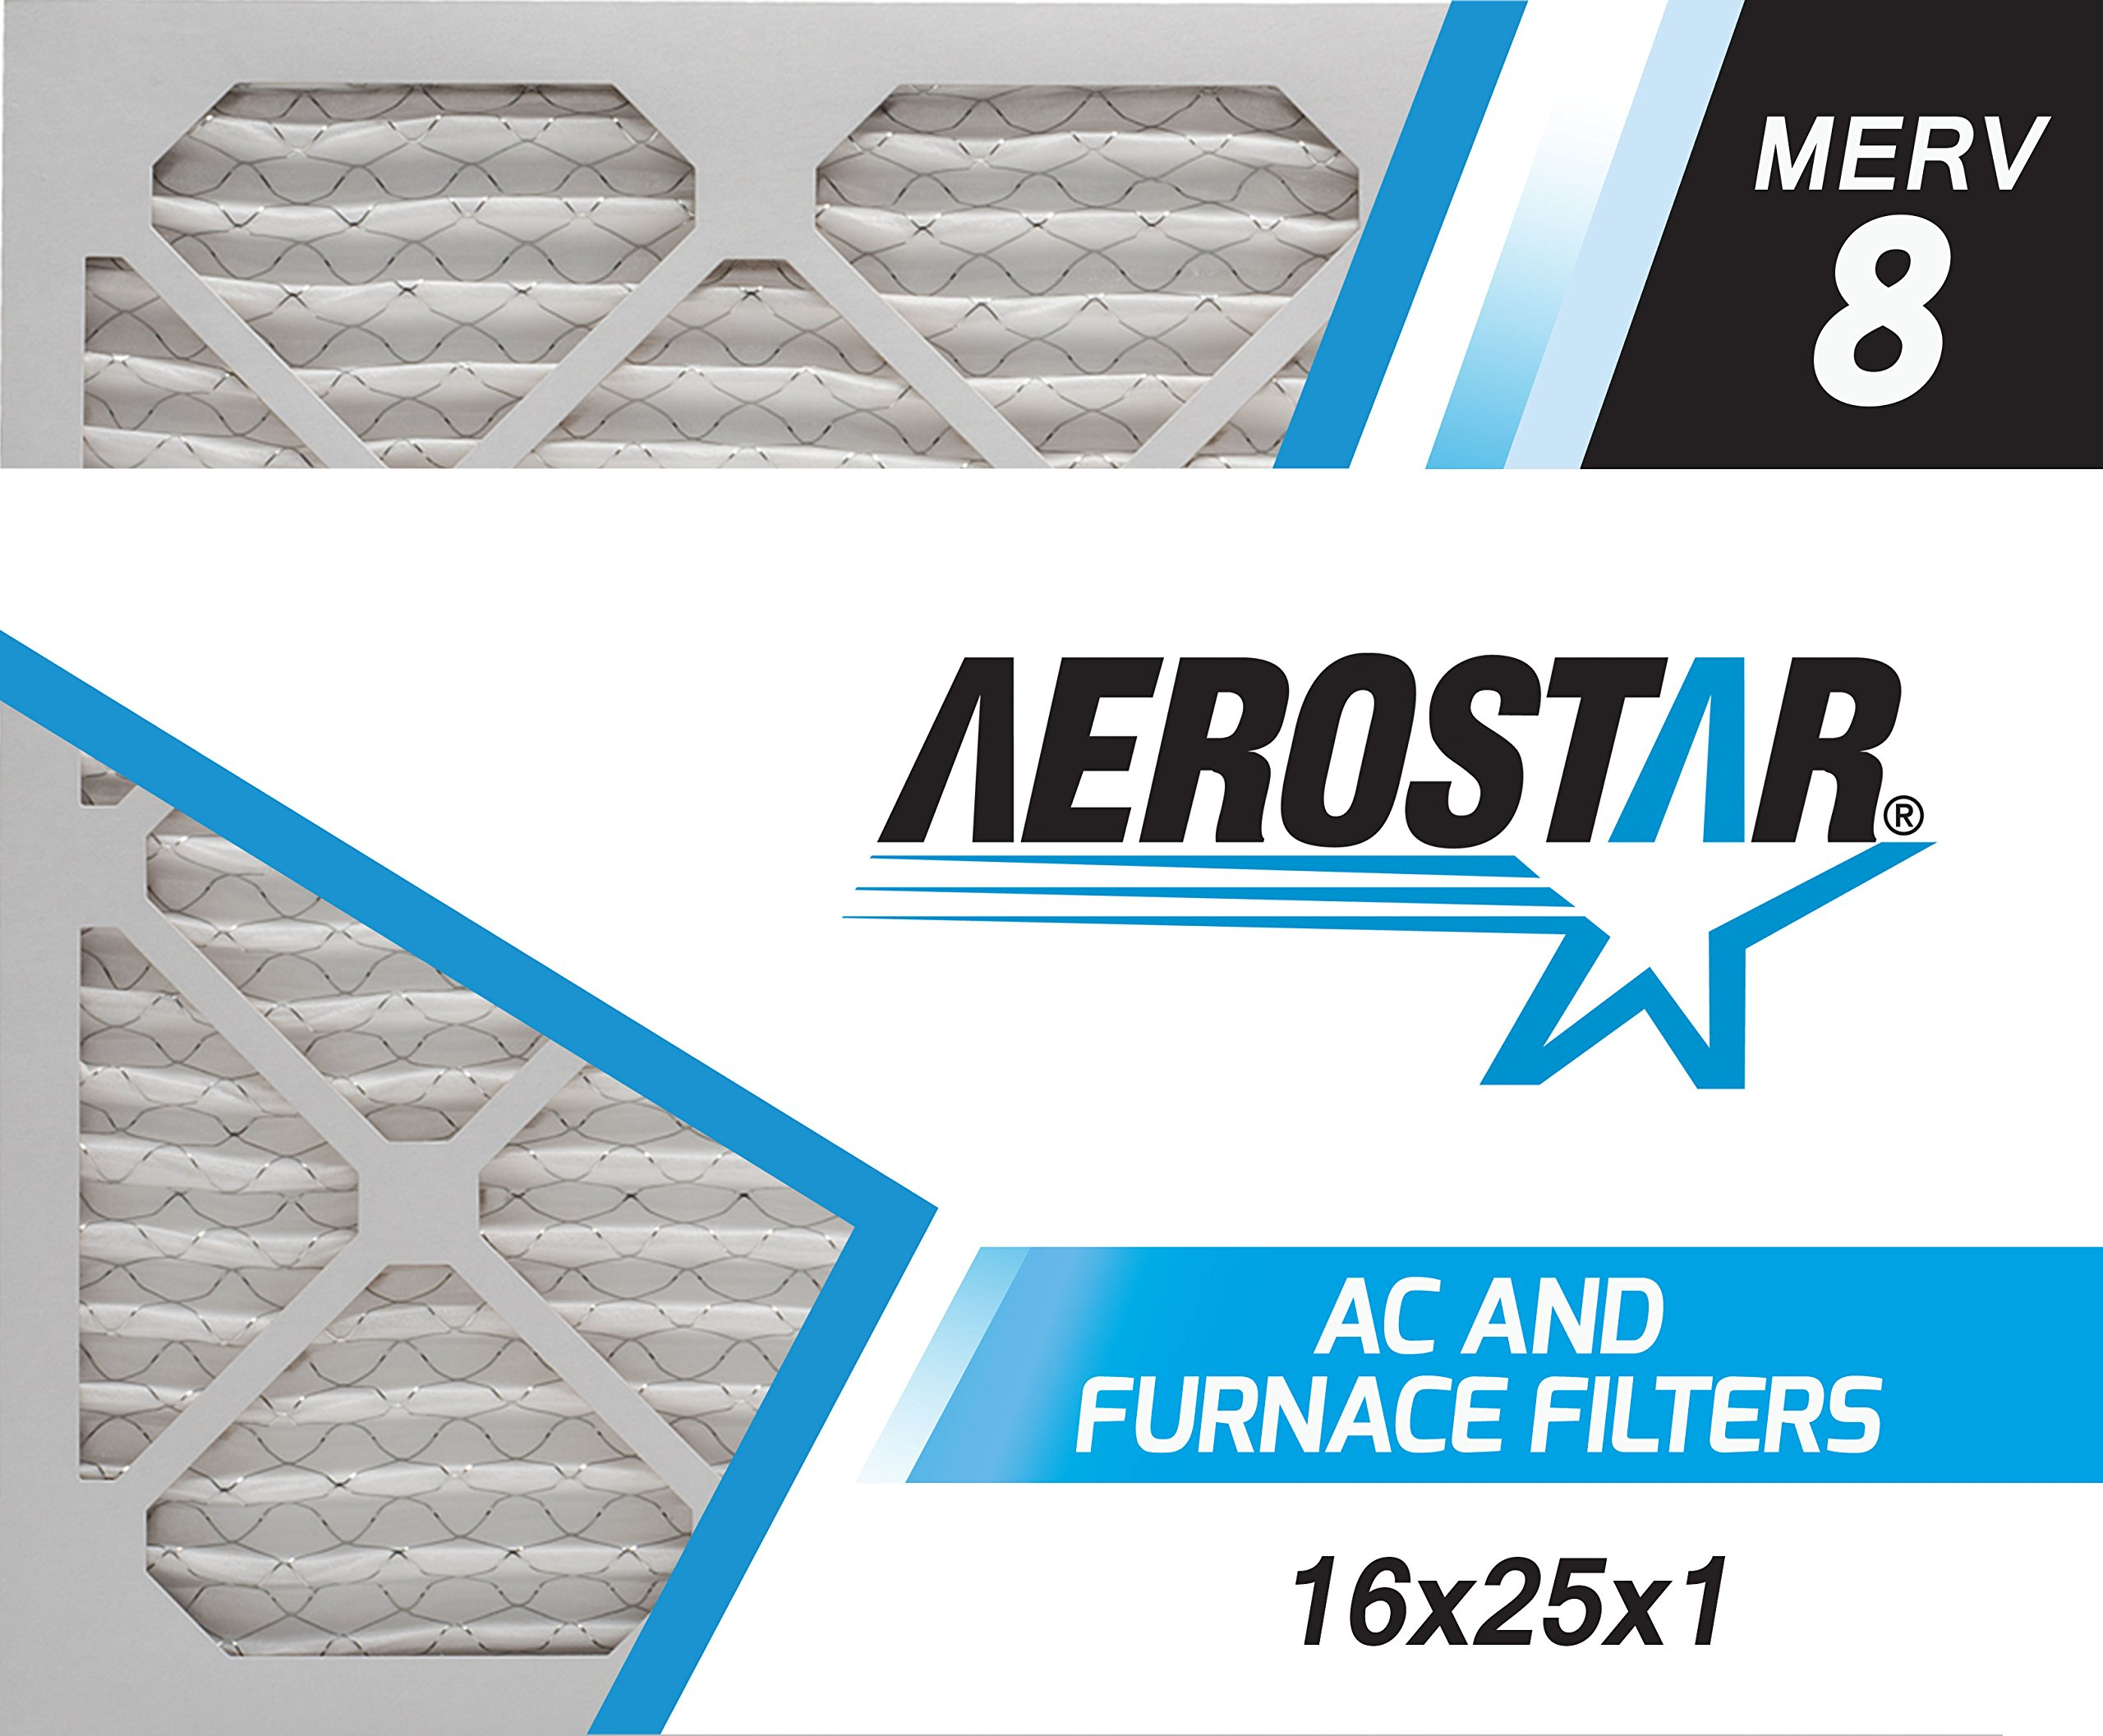 $5.49 each 15x20x1 MERV 8 Pleated AC Furnace Air Filters 6 Pack